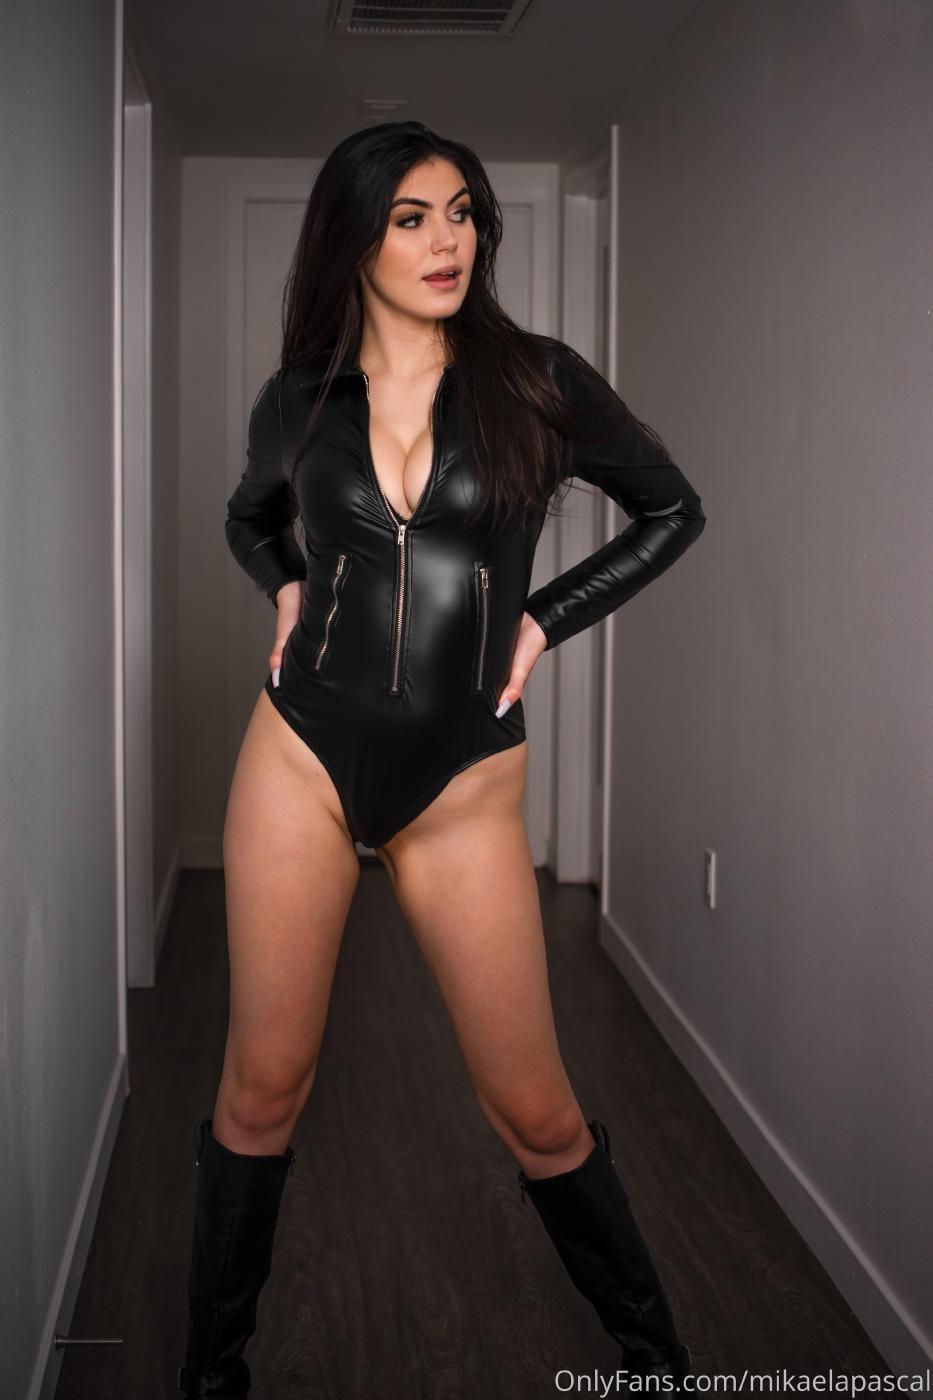 Mikaela Pascal Sexy Leather Bodysuit Onlyfans Set Leaked 0020